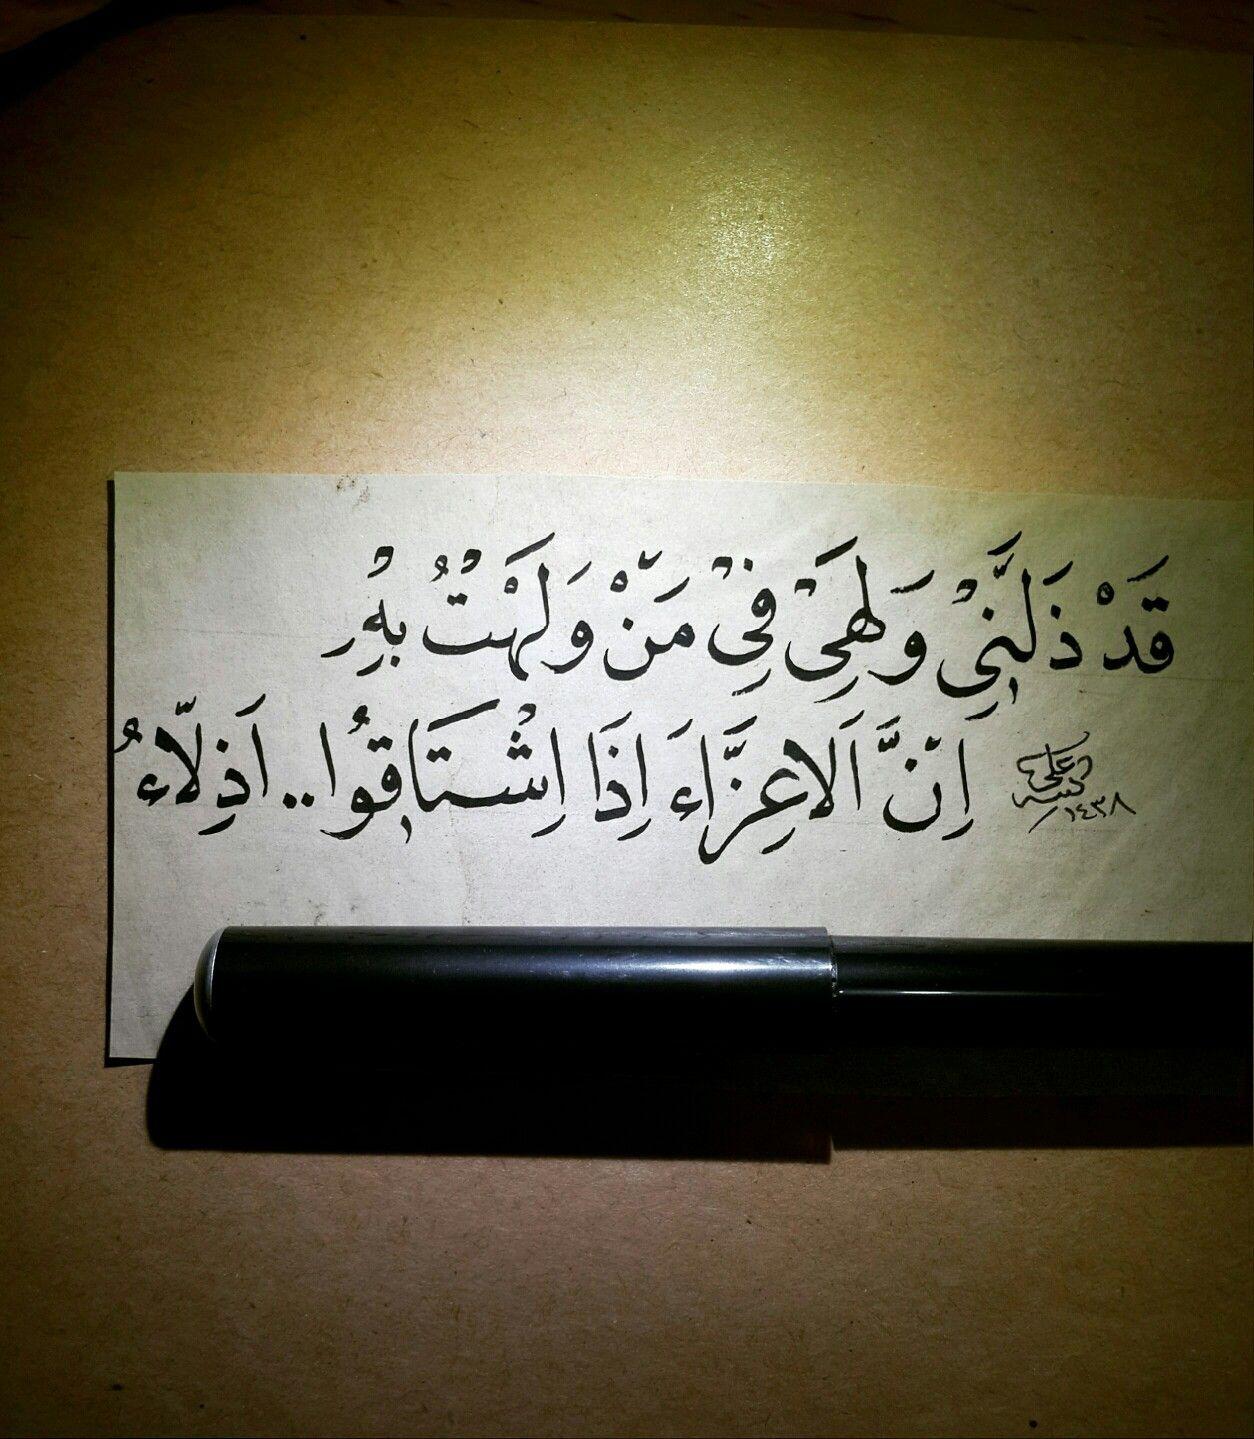 قد ذلنـي خطي نسخ اقتباسات العراق خط عربي بغداد Love Quotes Quotes Arabic Words